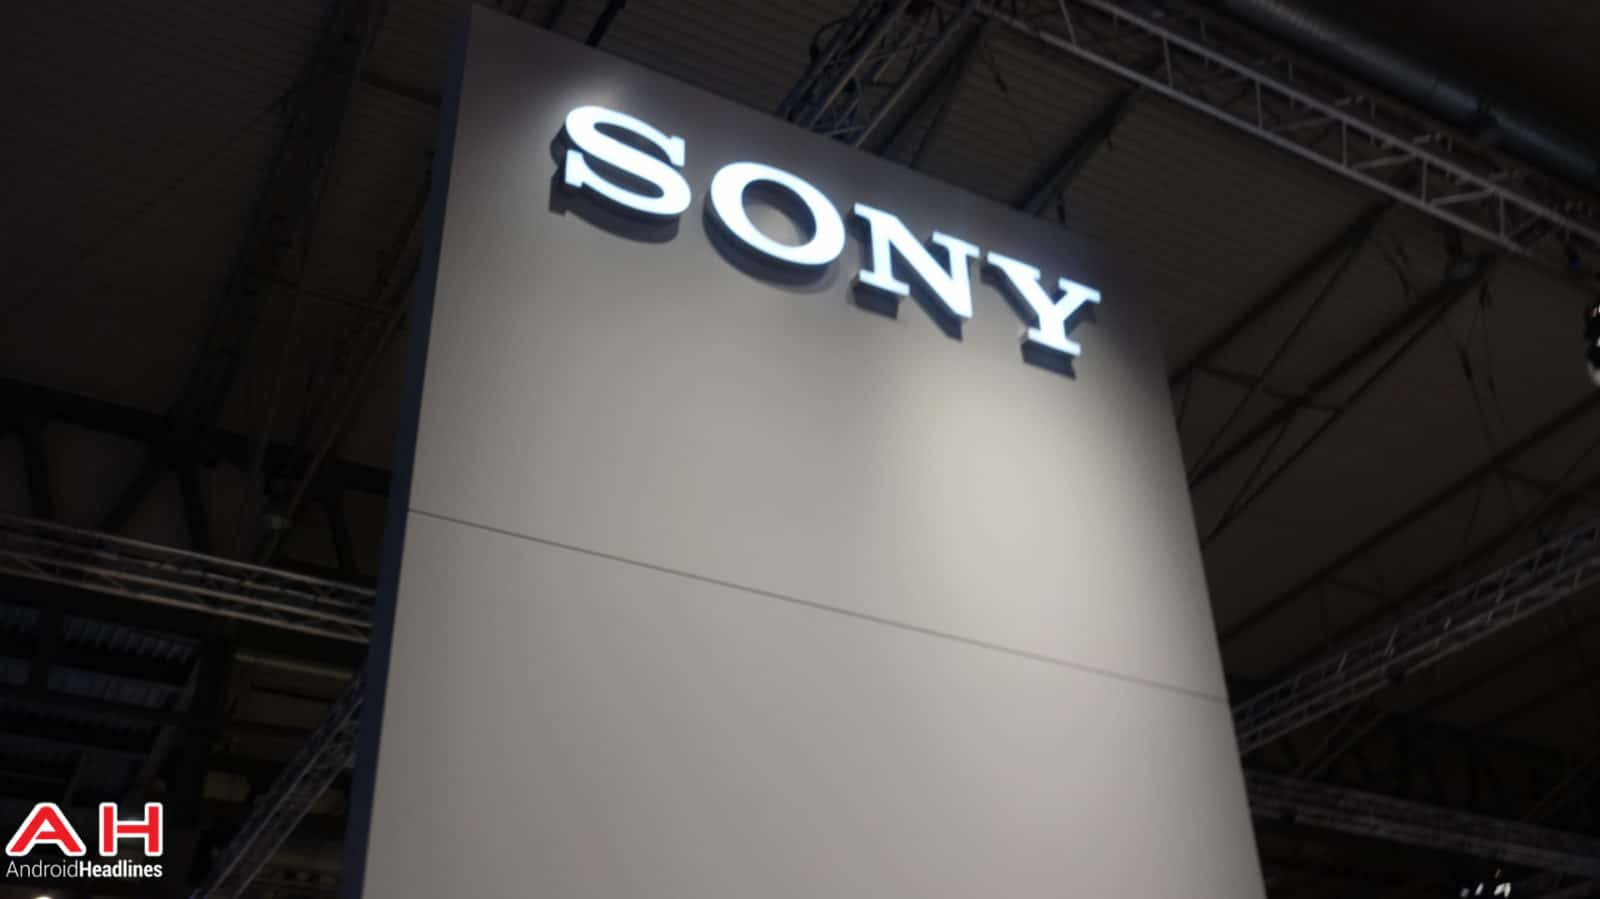 Sony-Logo-AH10